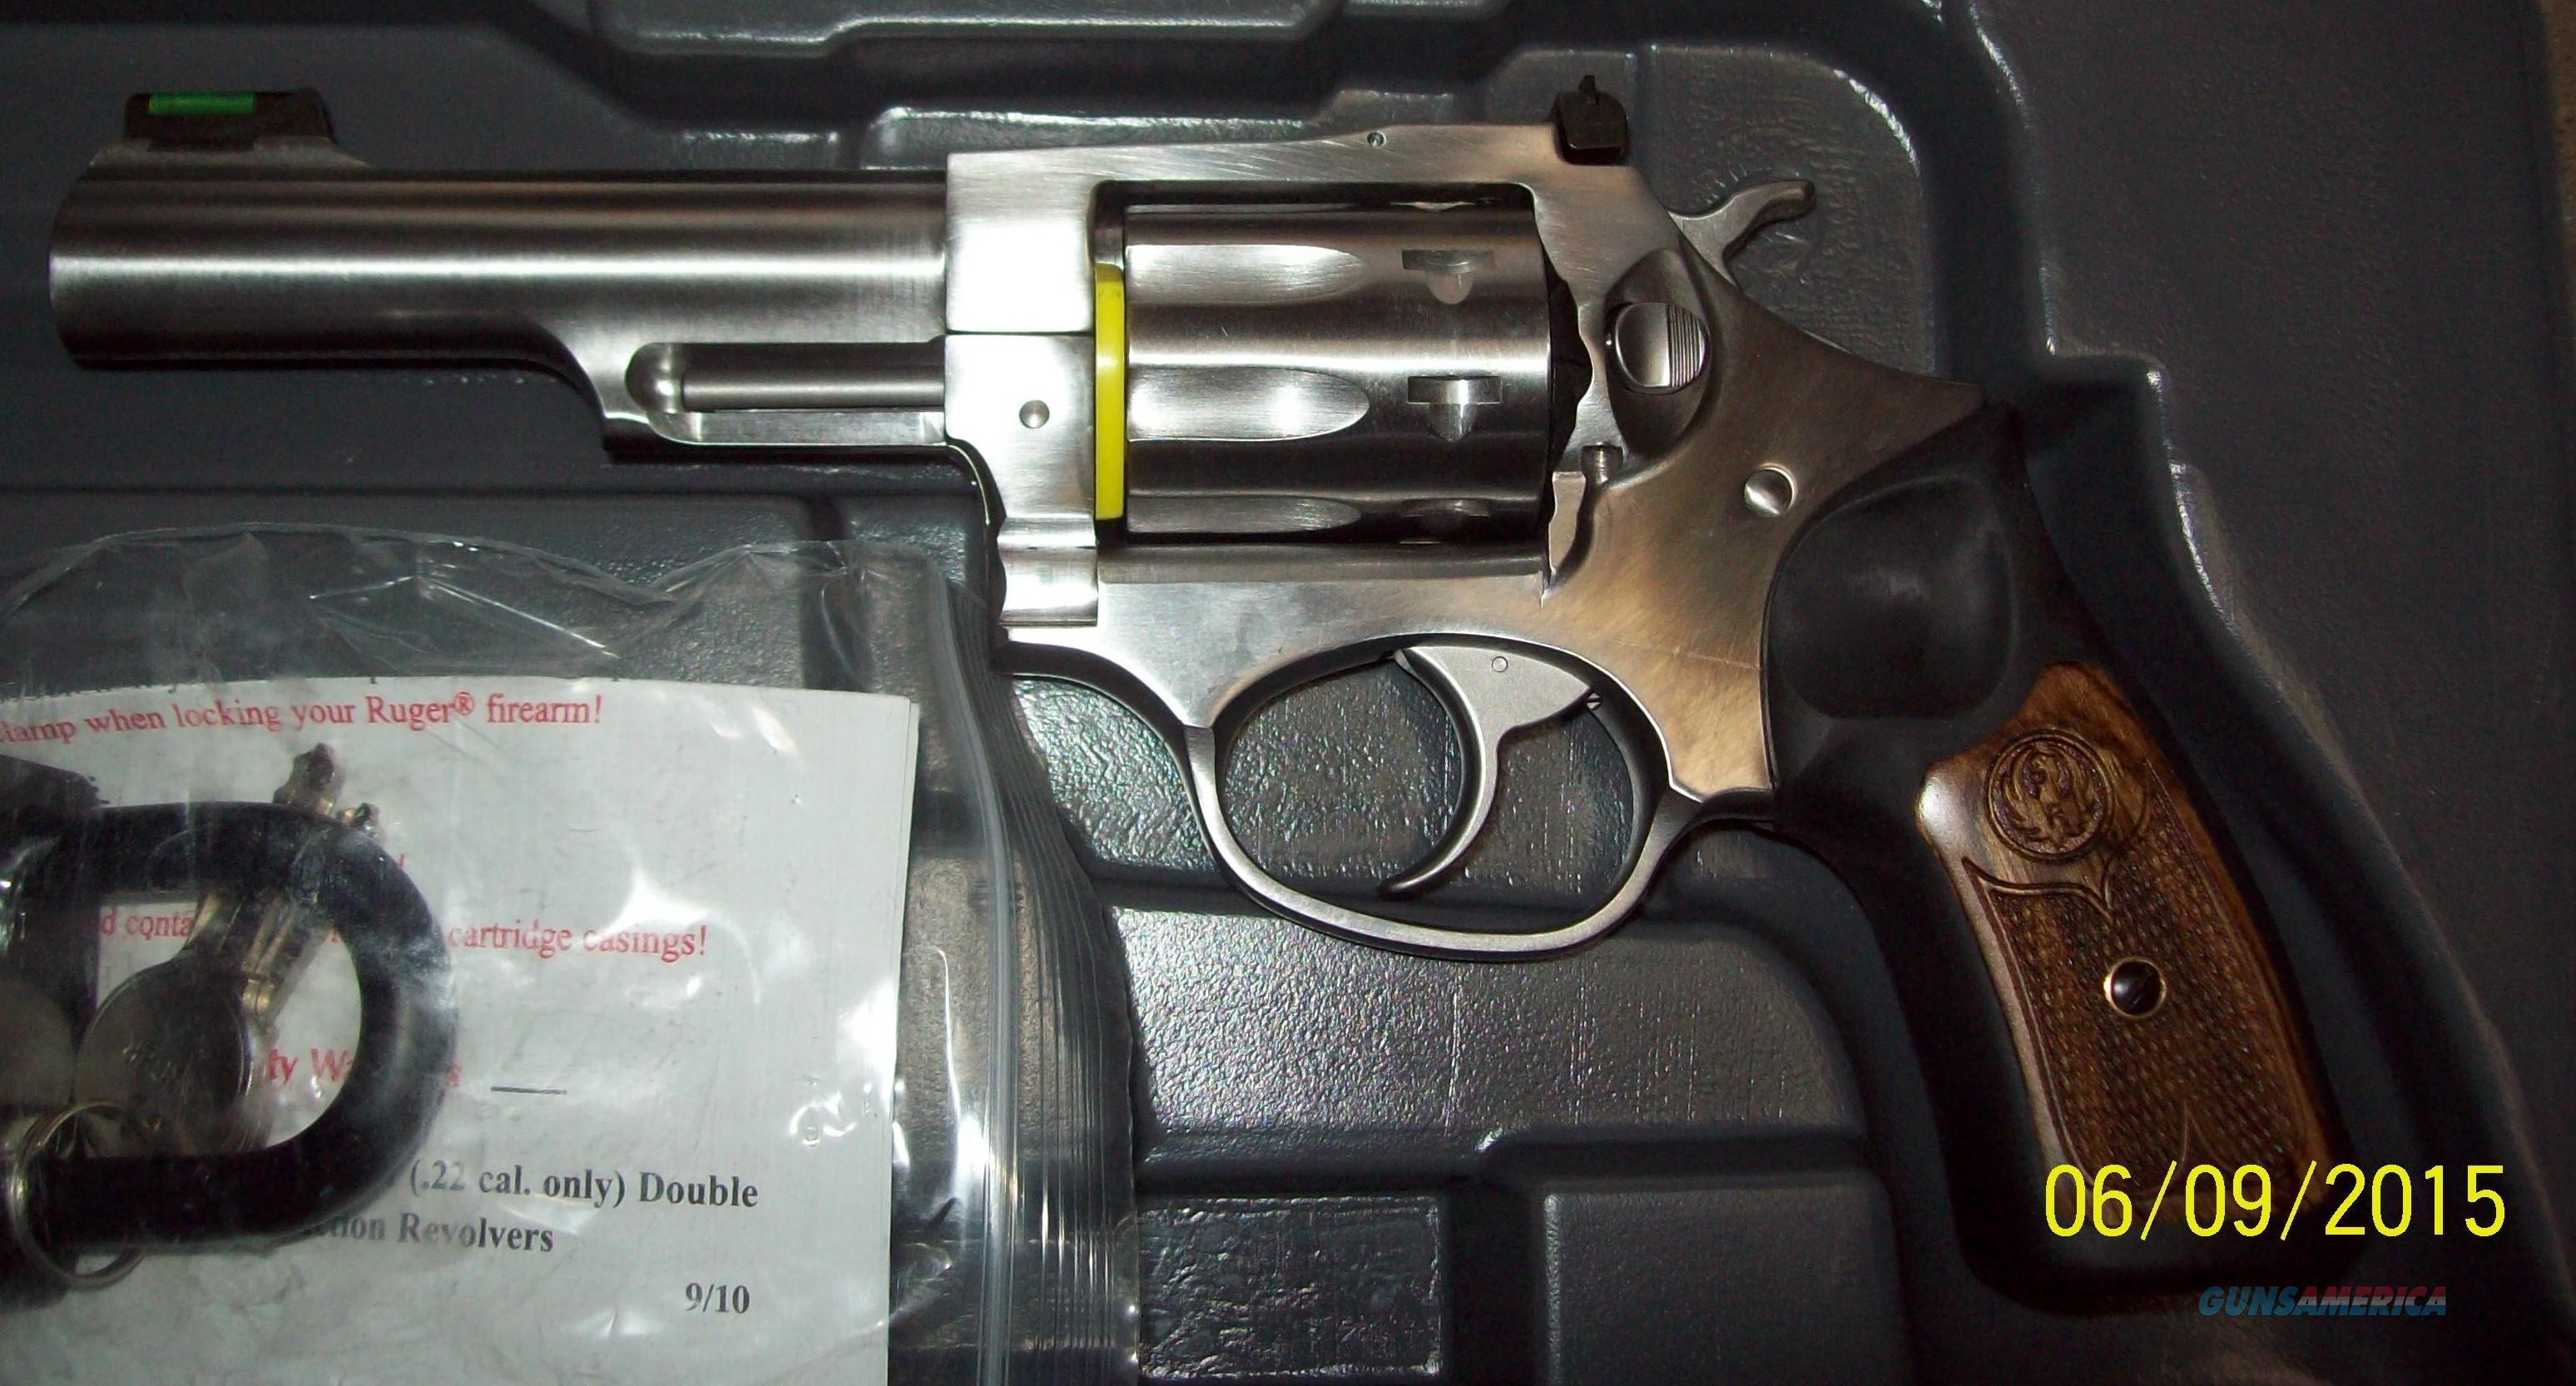 SP-101 .22 LR  Guns > Pistols > Ruger Double Action Revolver > SP101 Type